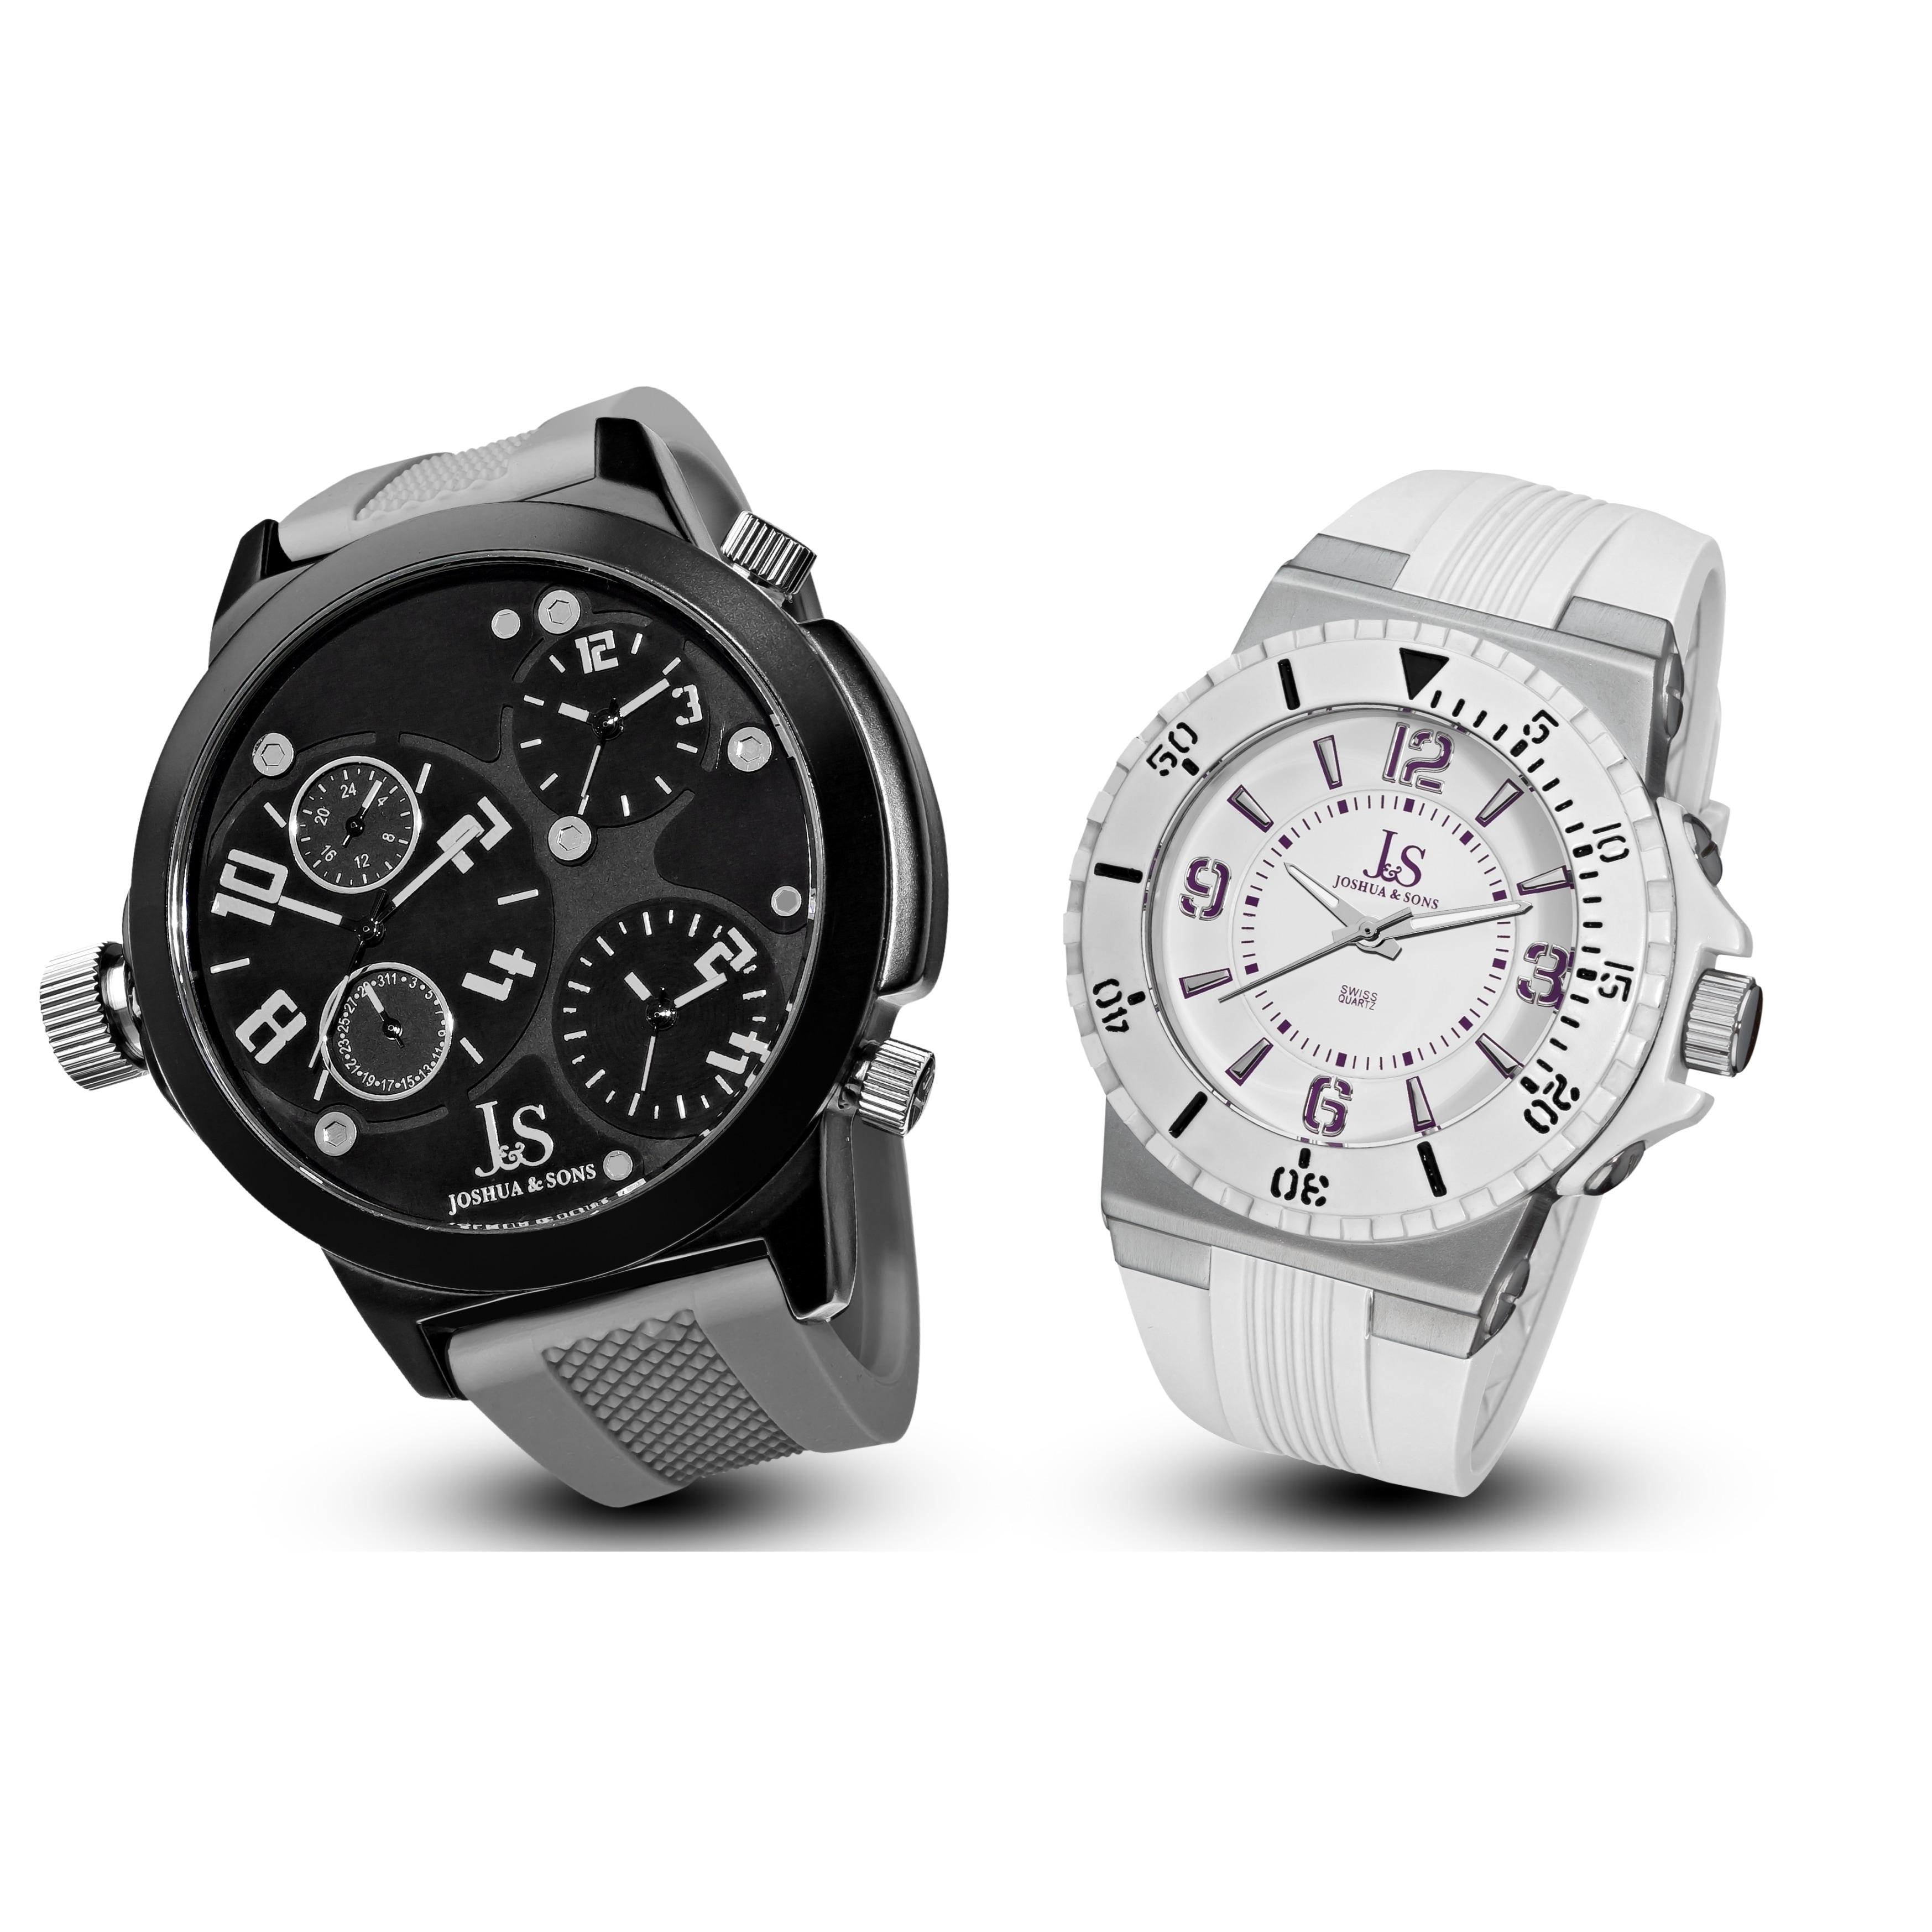 J&S Men's Minute Track, Multifunction Strap Watch Set (Se...